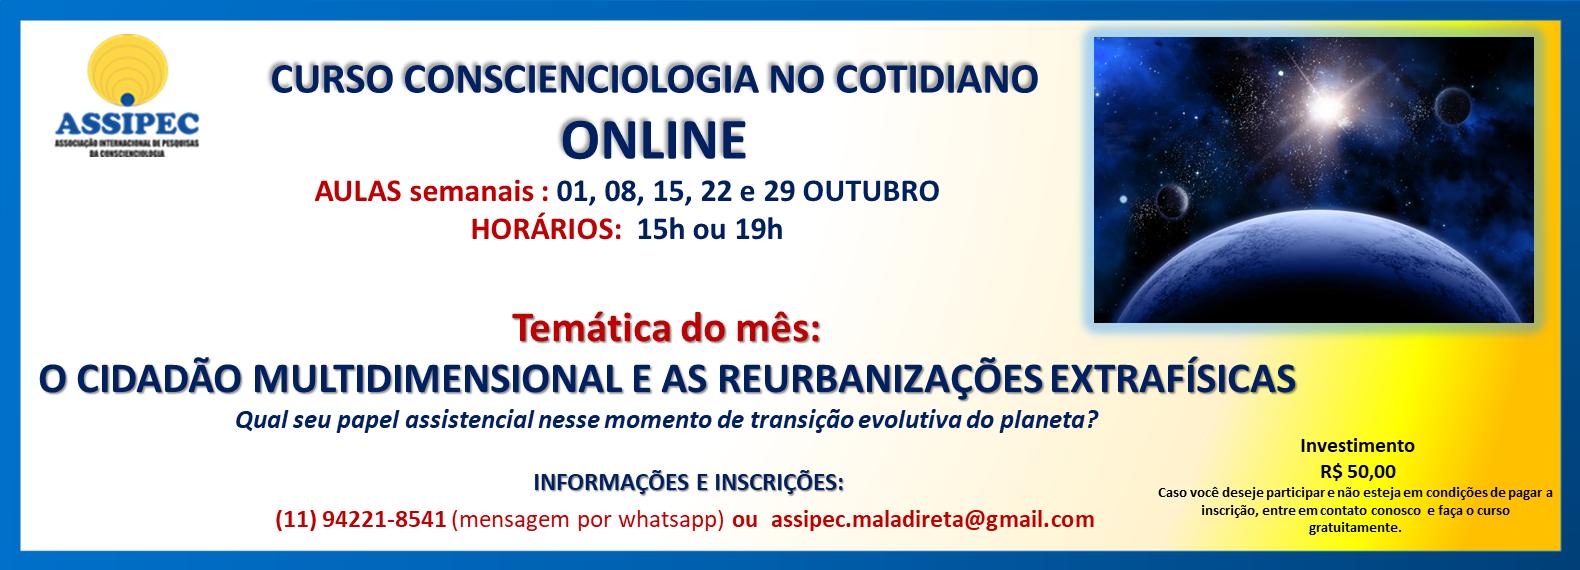 site CCIOLOGIA COTIDIANO OUTUBROL ONLINE